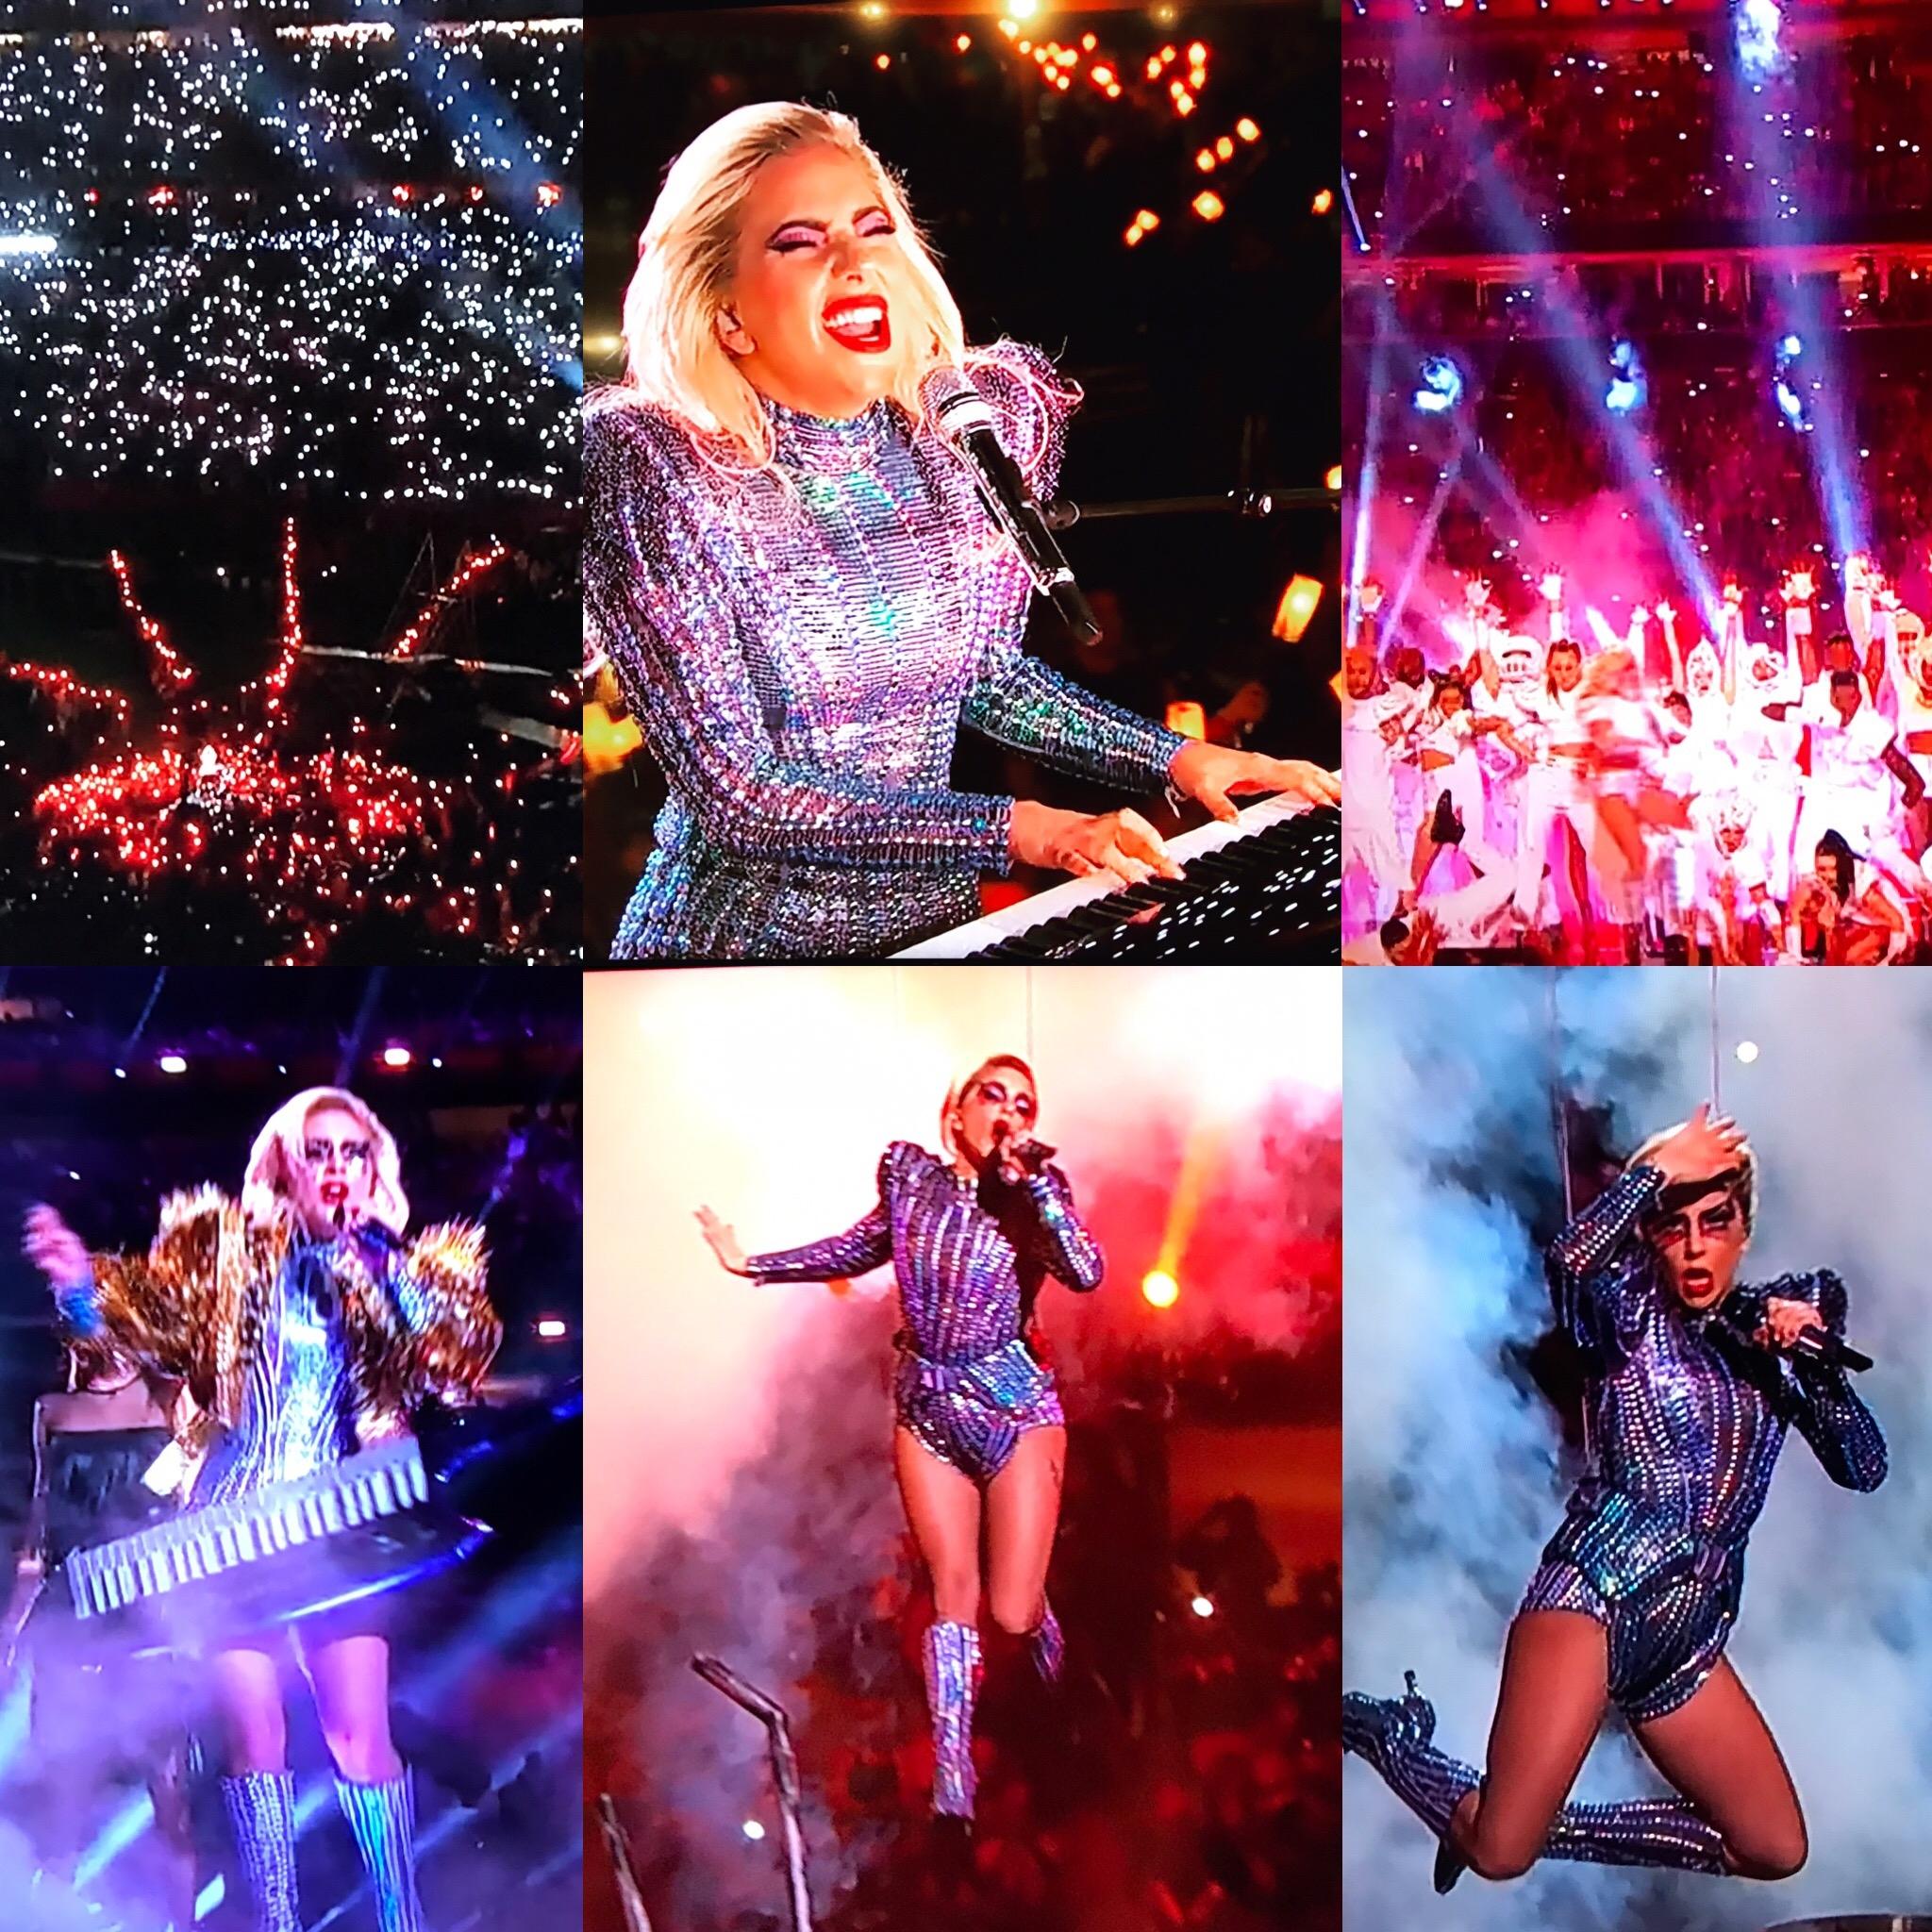 WATCH Lady Gaga's incredible Superbowl LI Halftime Performance!